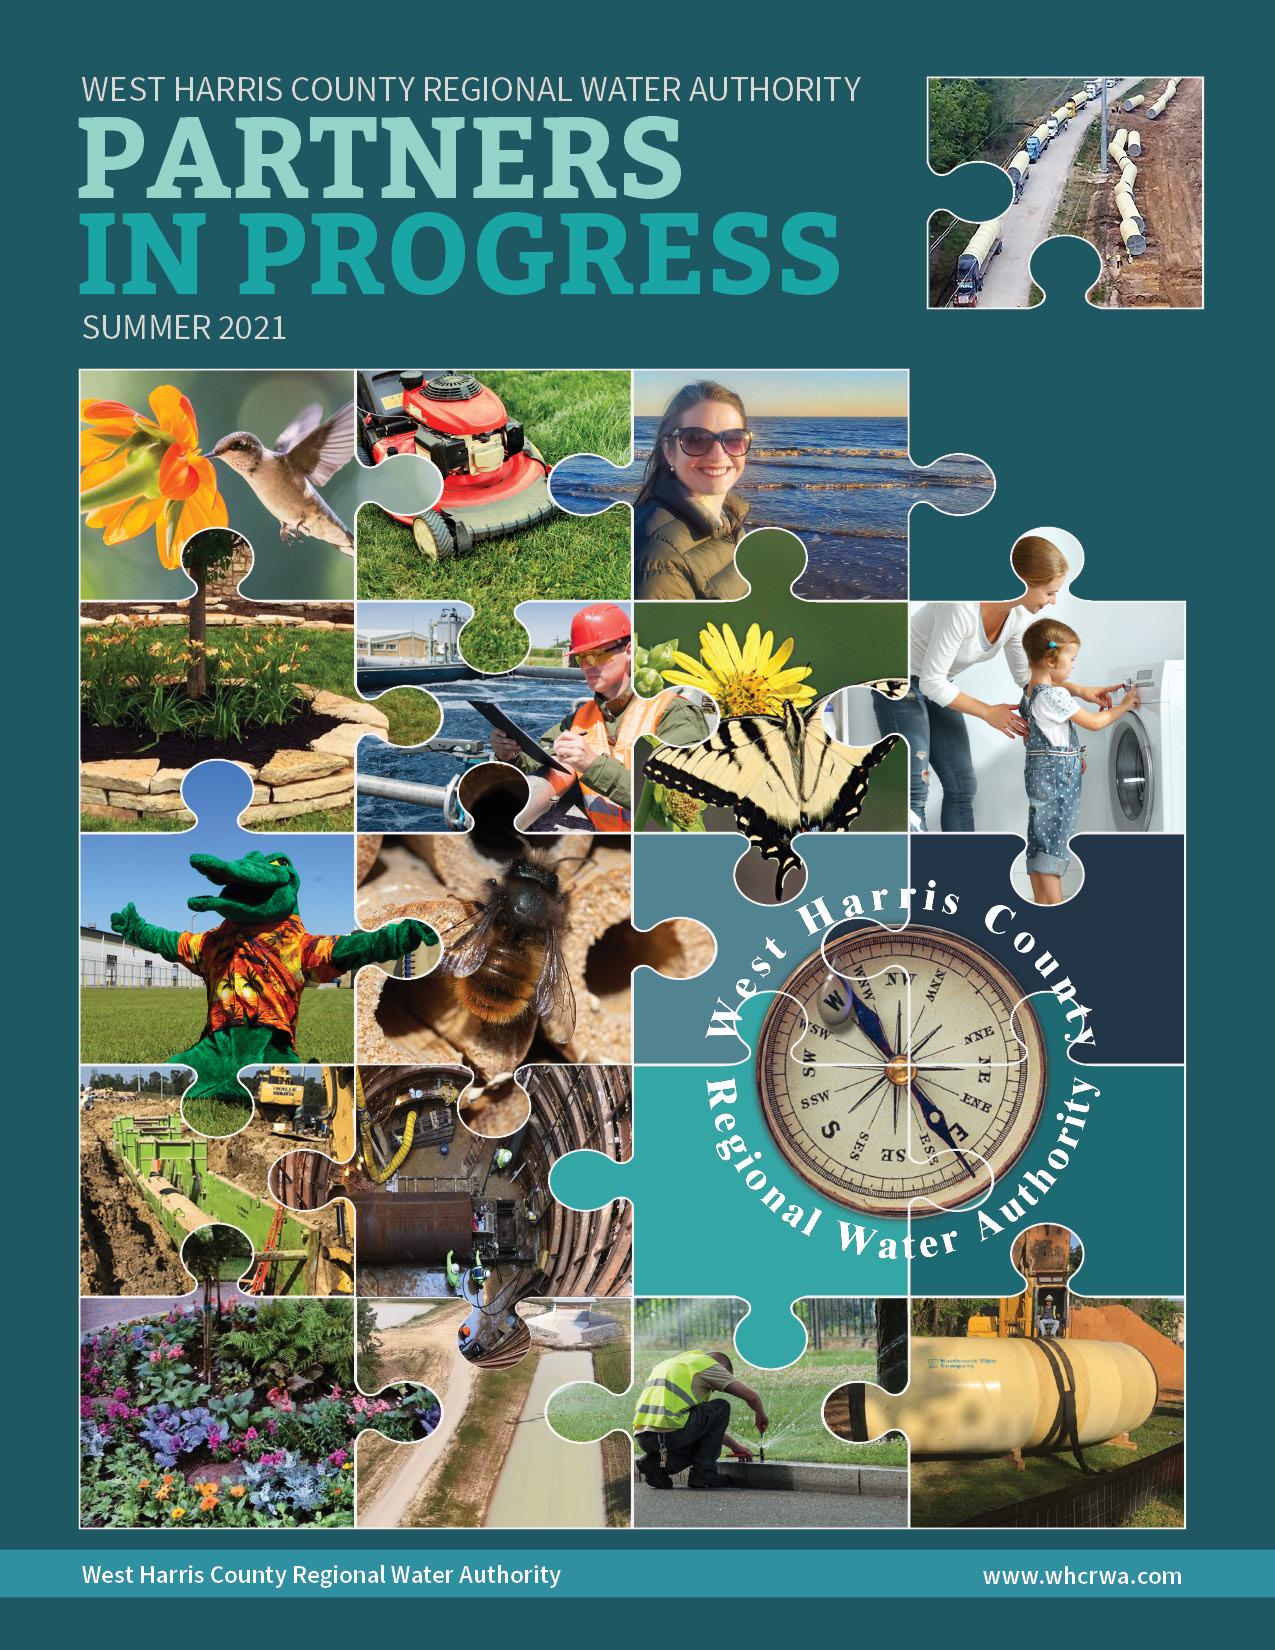 Partners in Progress Summer 2021